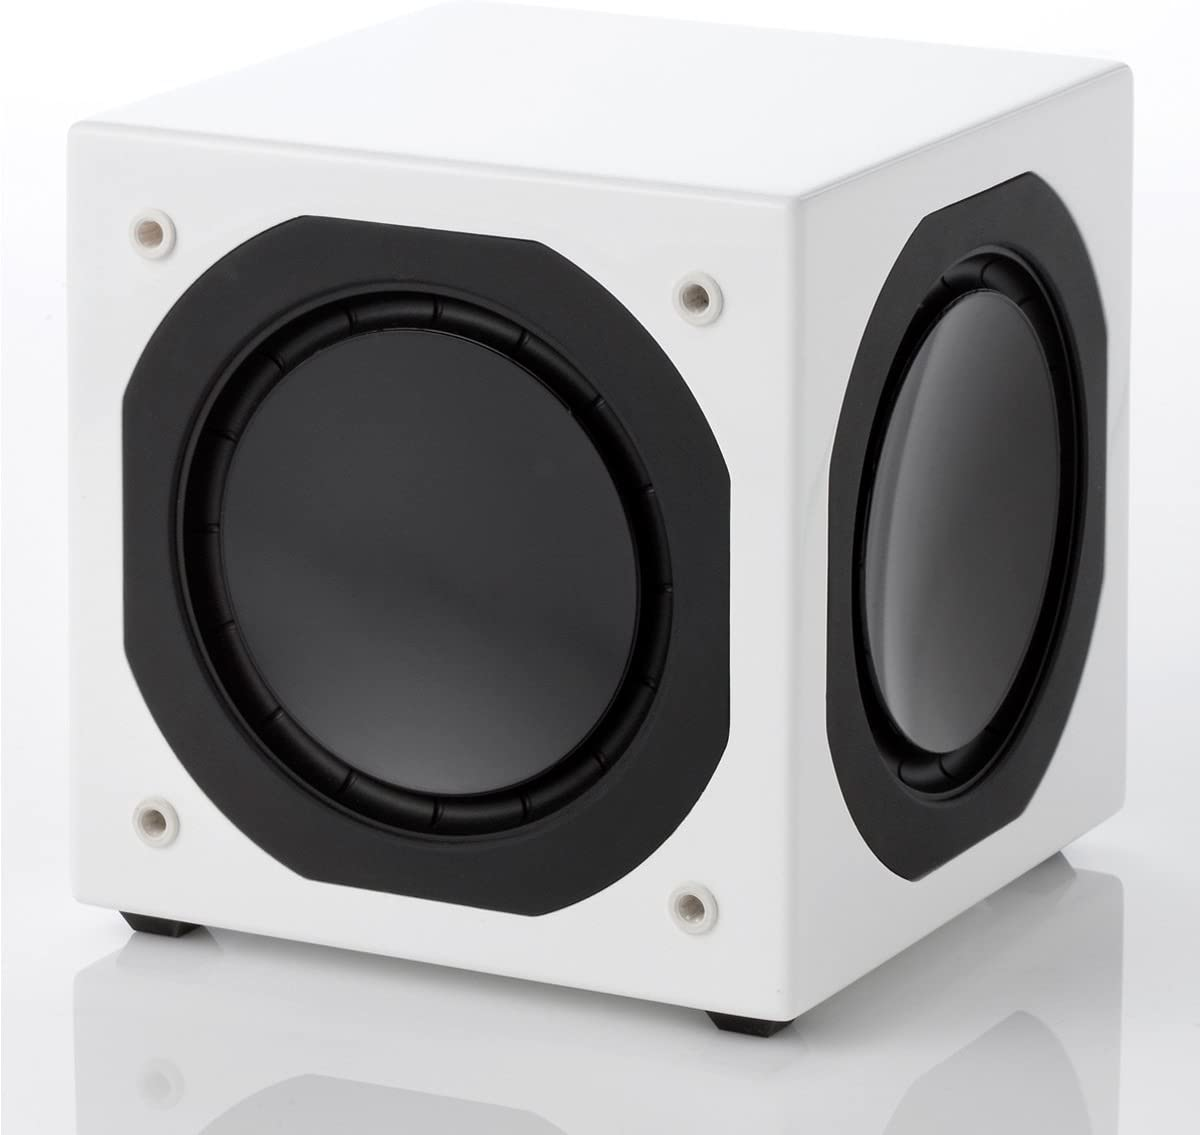 Jamo Sub800 Subwoofer Farbe Weiß Audio Hifi